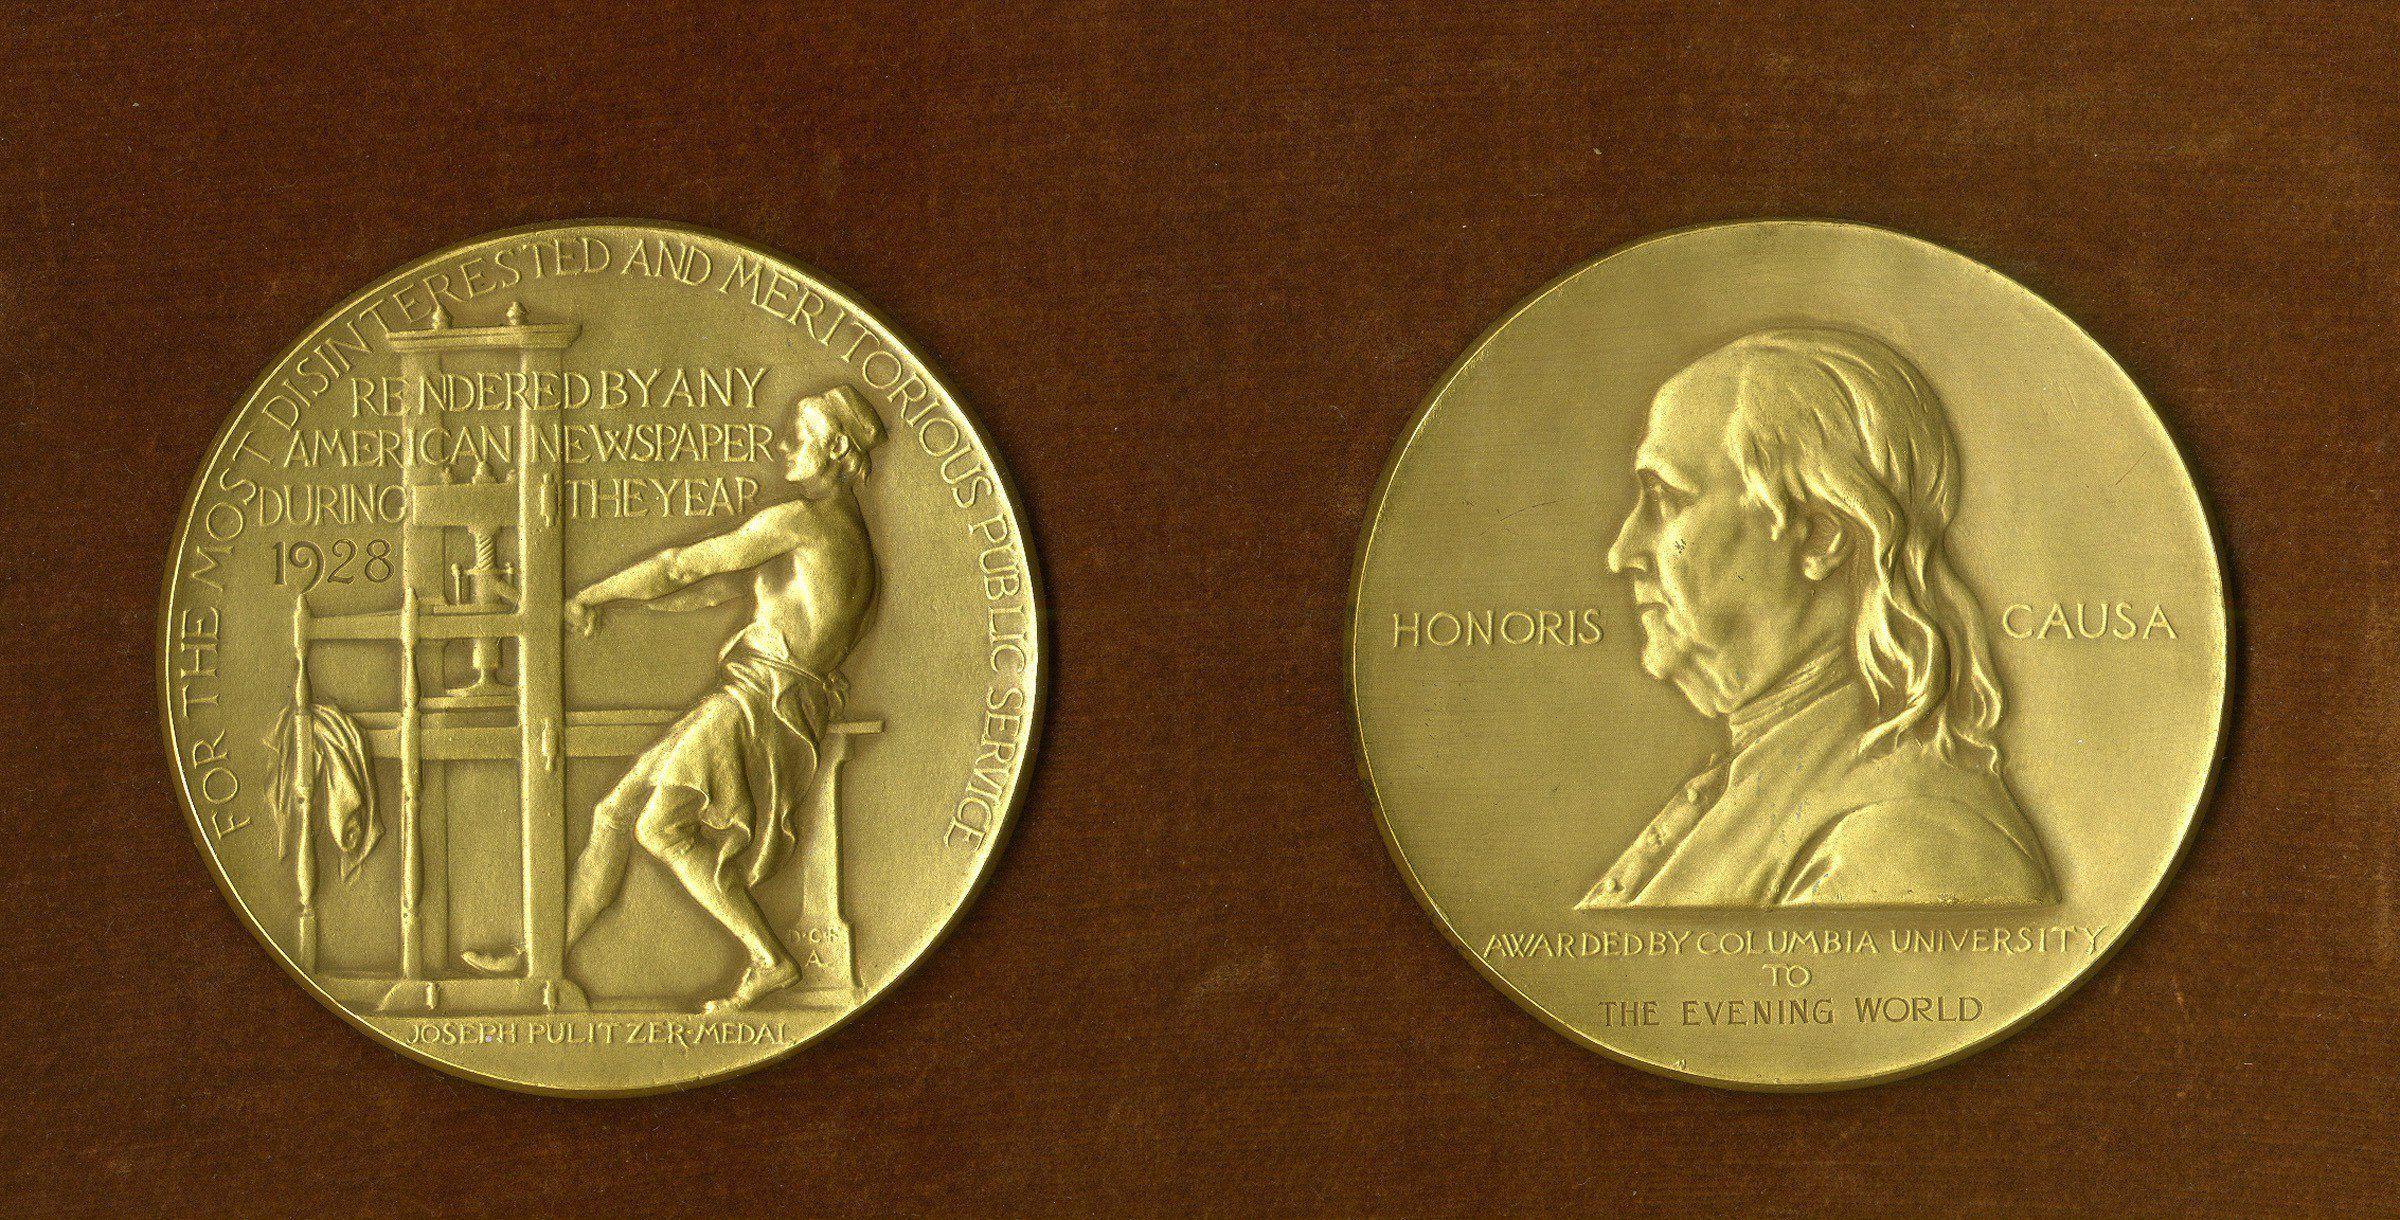 I libri vincitori del Premio Pulitzer 2018